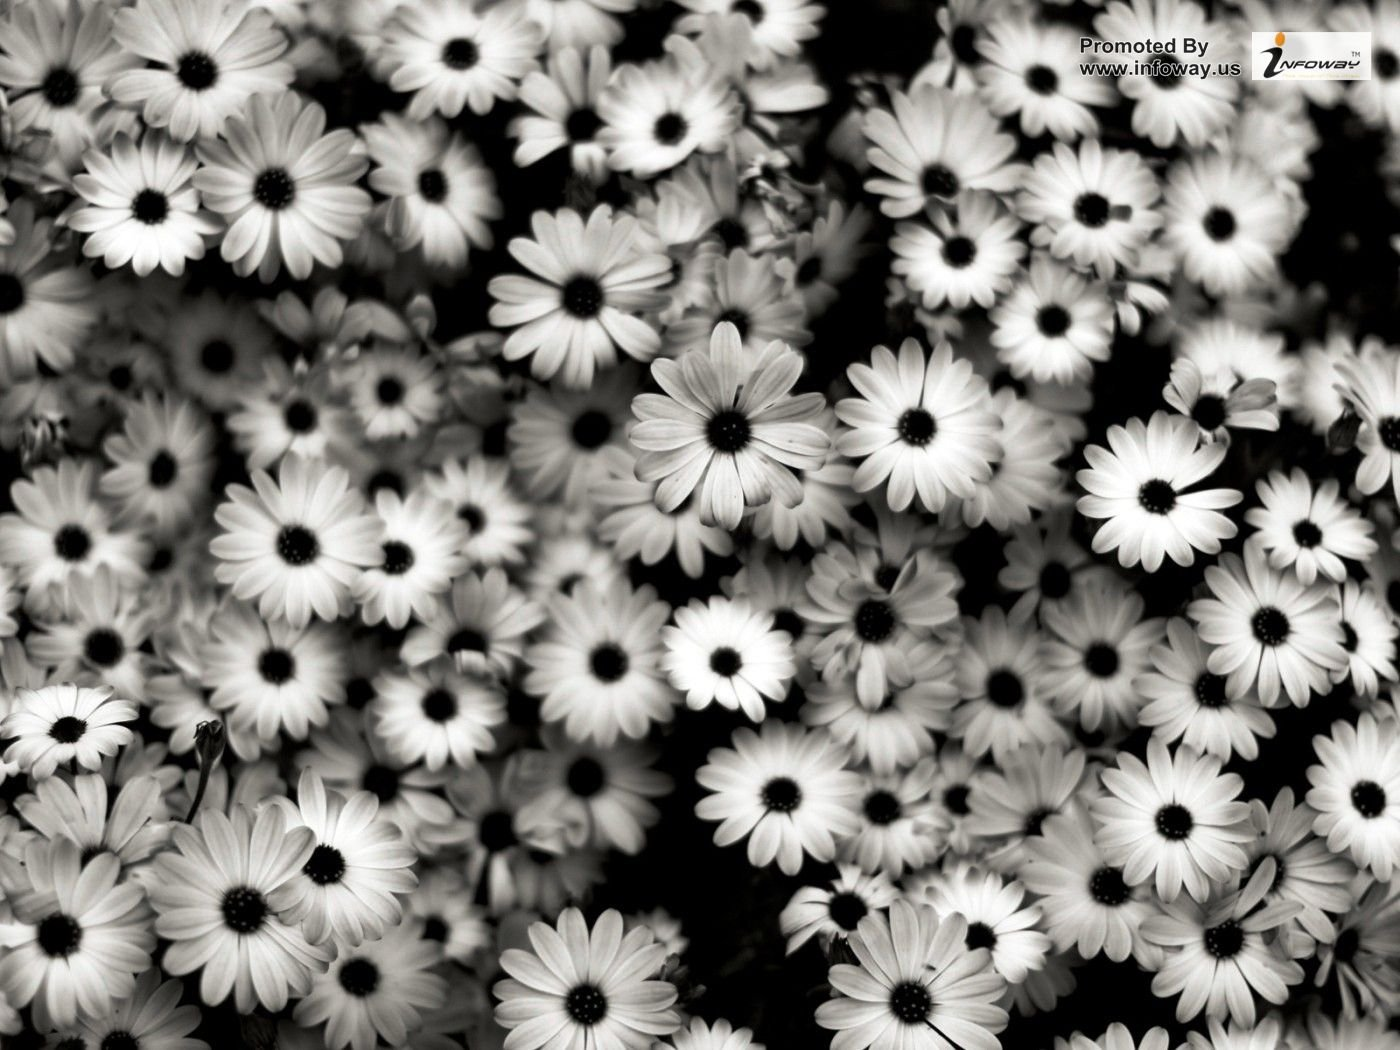 Black and White Flowers Wallpaper - WallpaperSafari